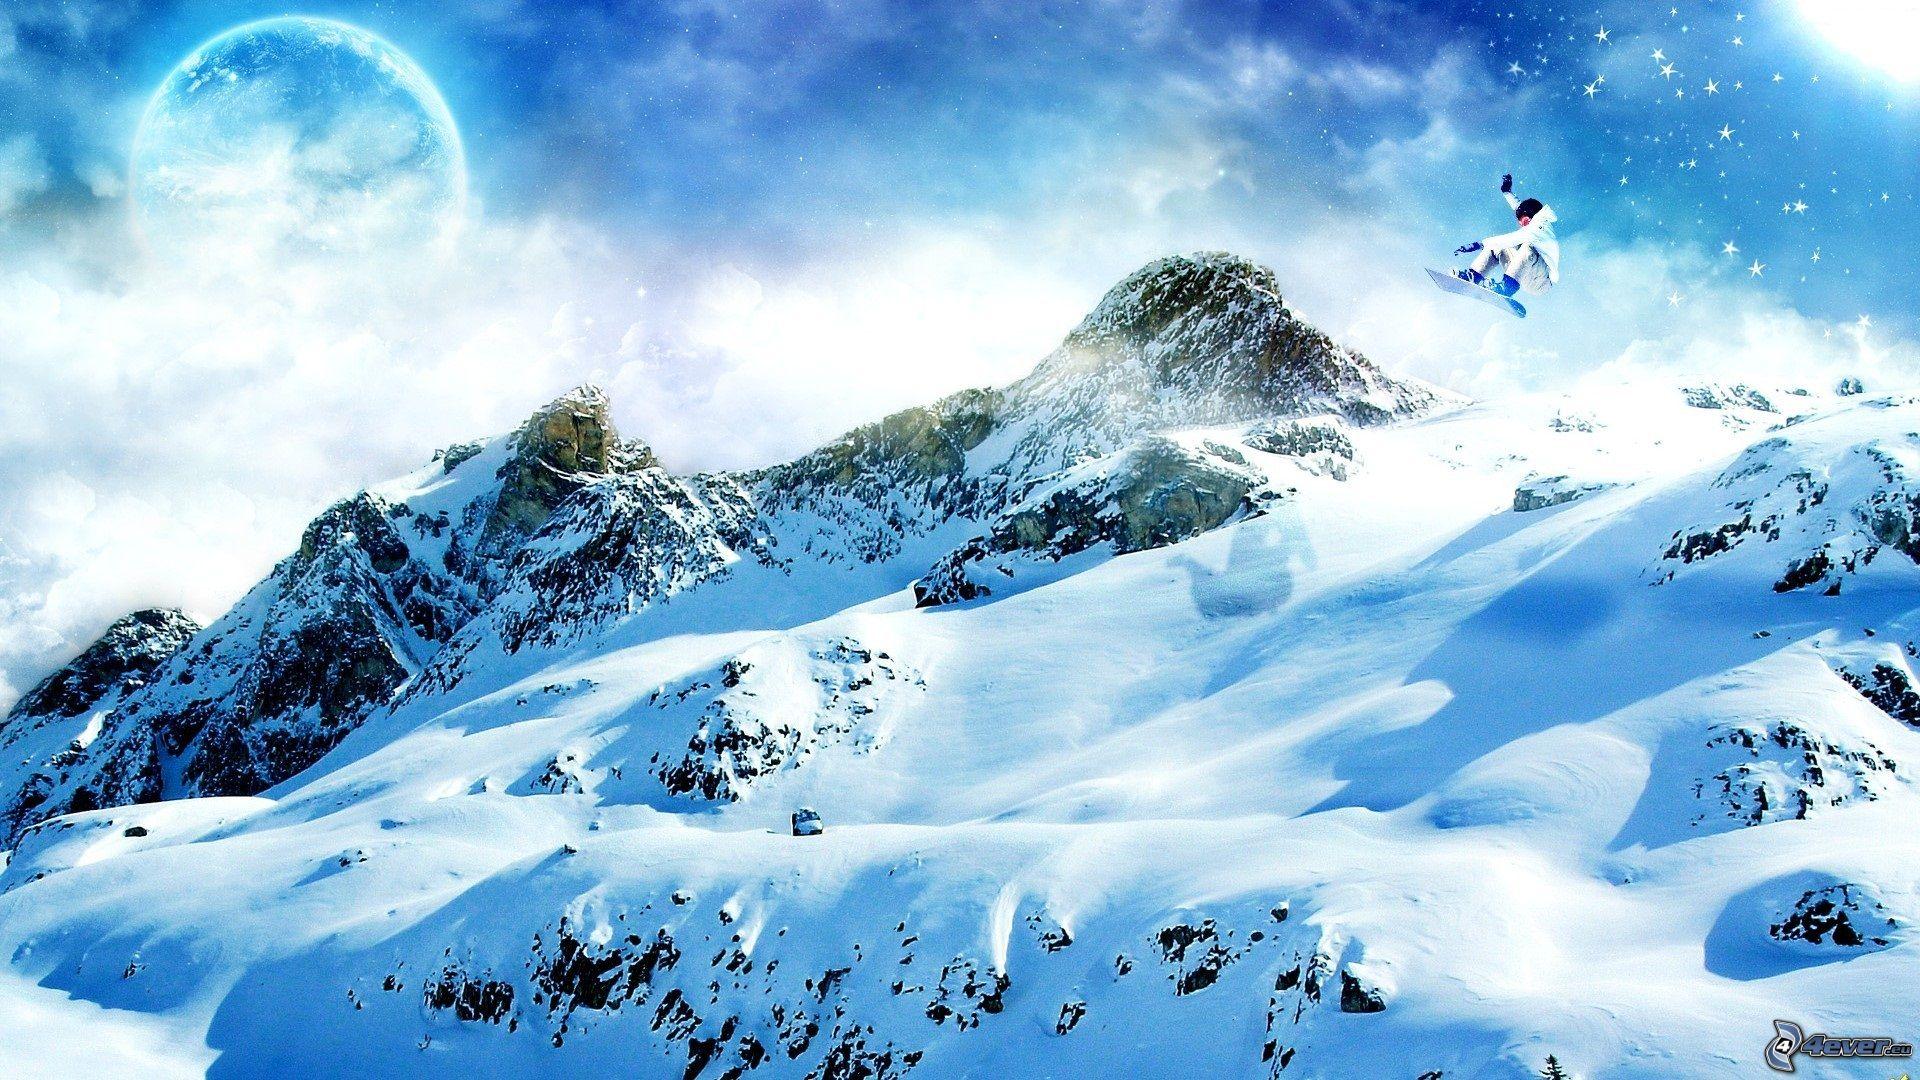 Wallpaper snowboard hd gratuit t l charger sur ngn mag for Foto de fond ecran